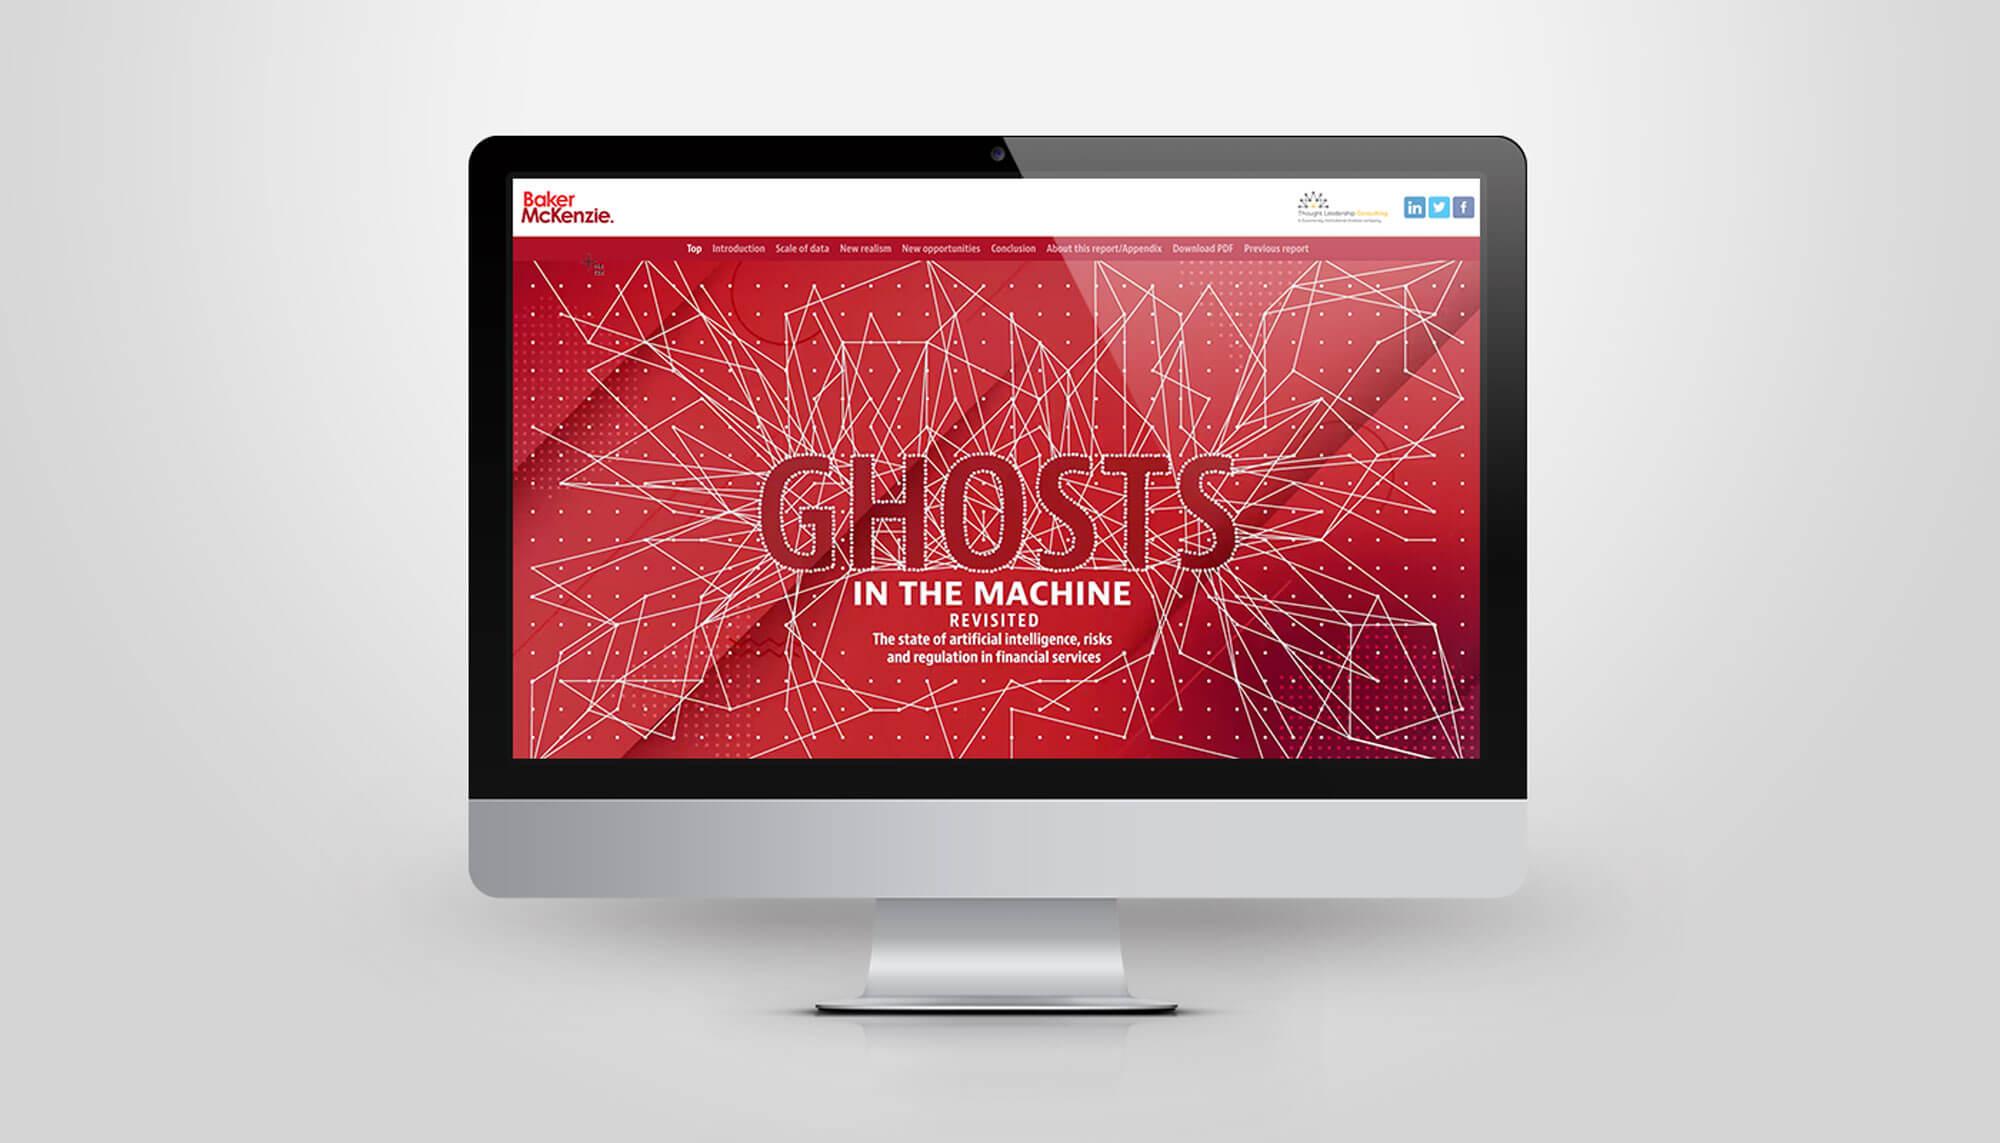 iMac_Ghosts2_1.jpg